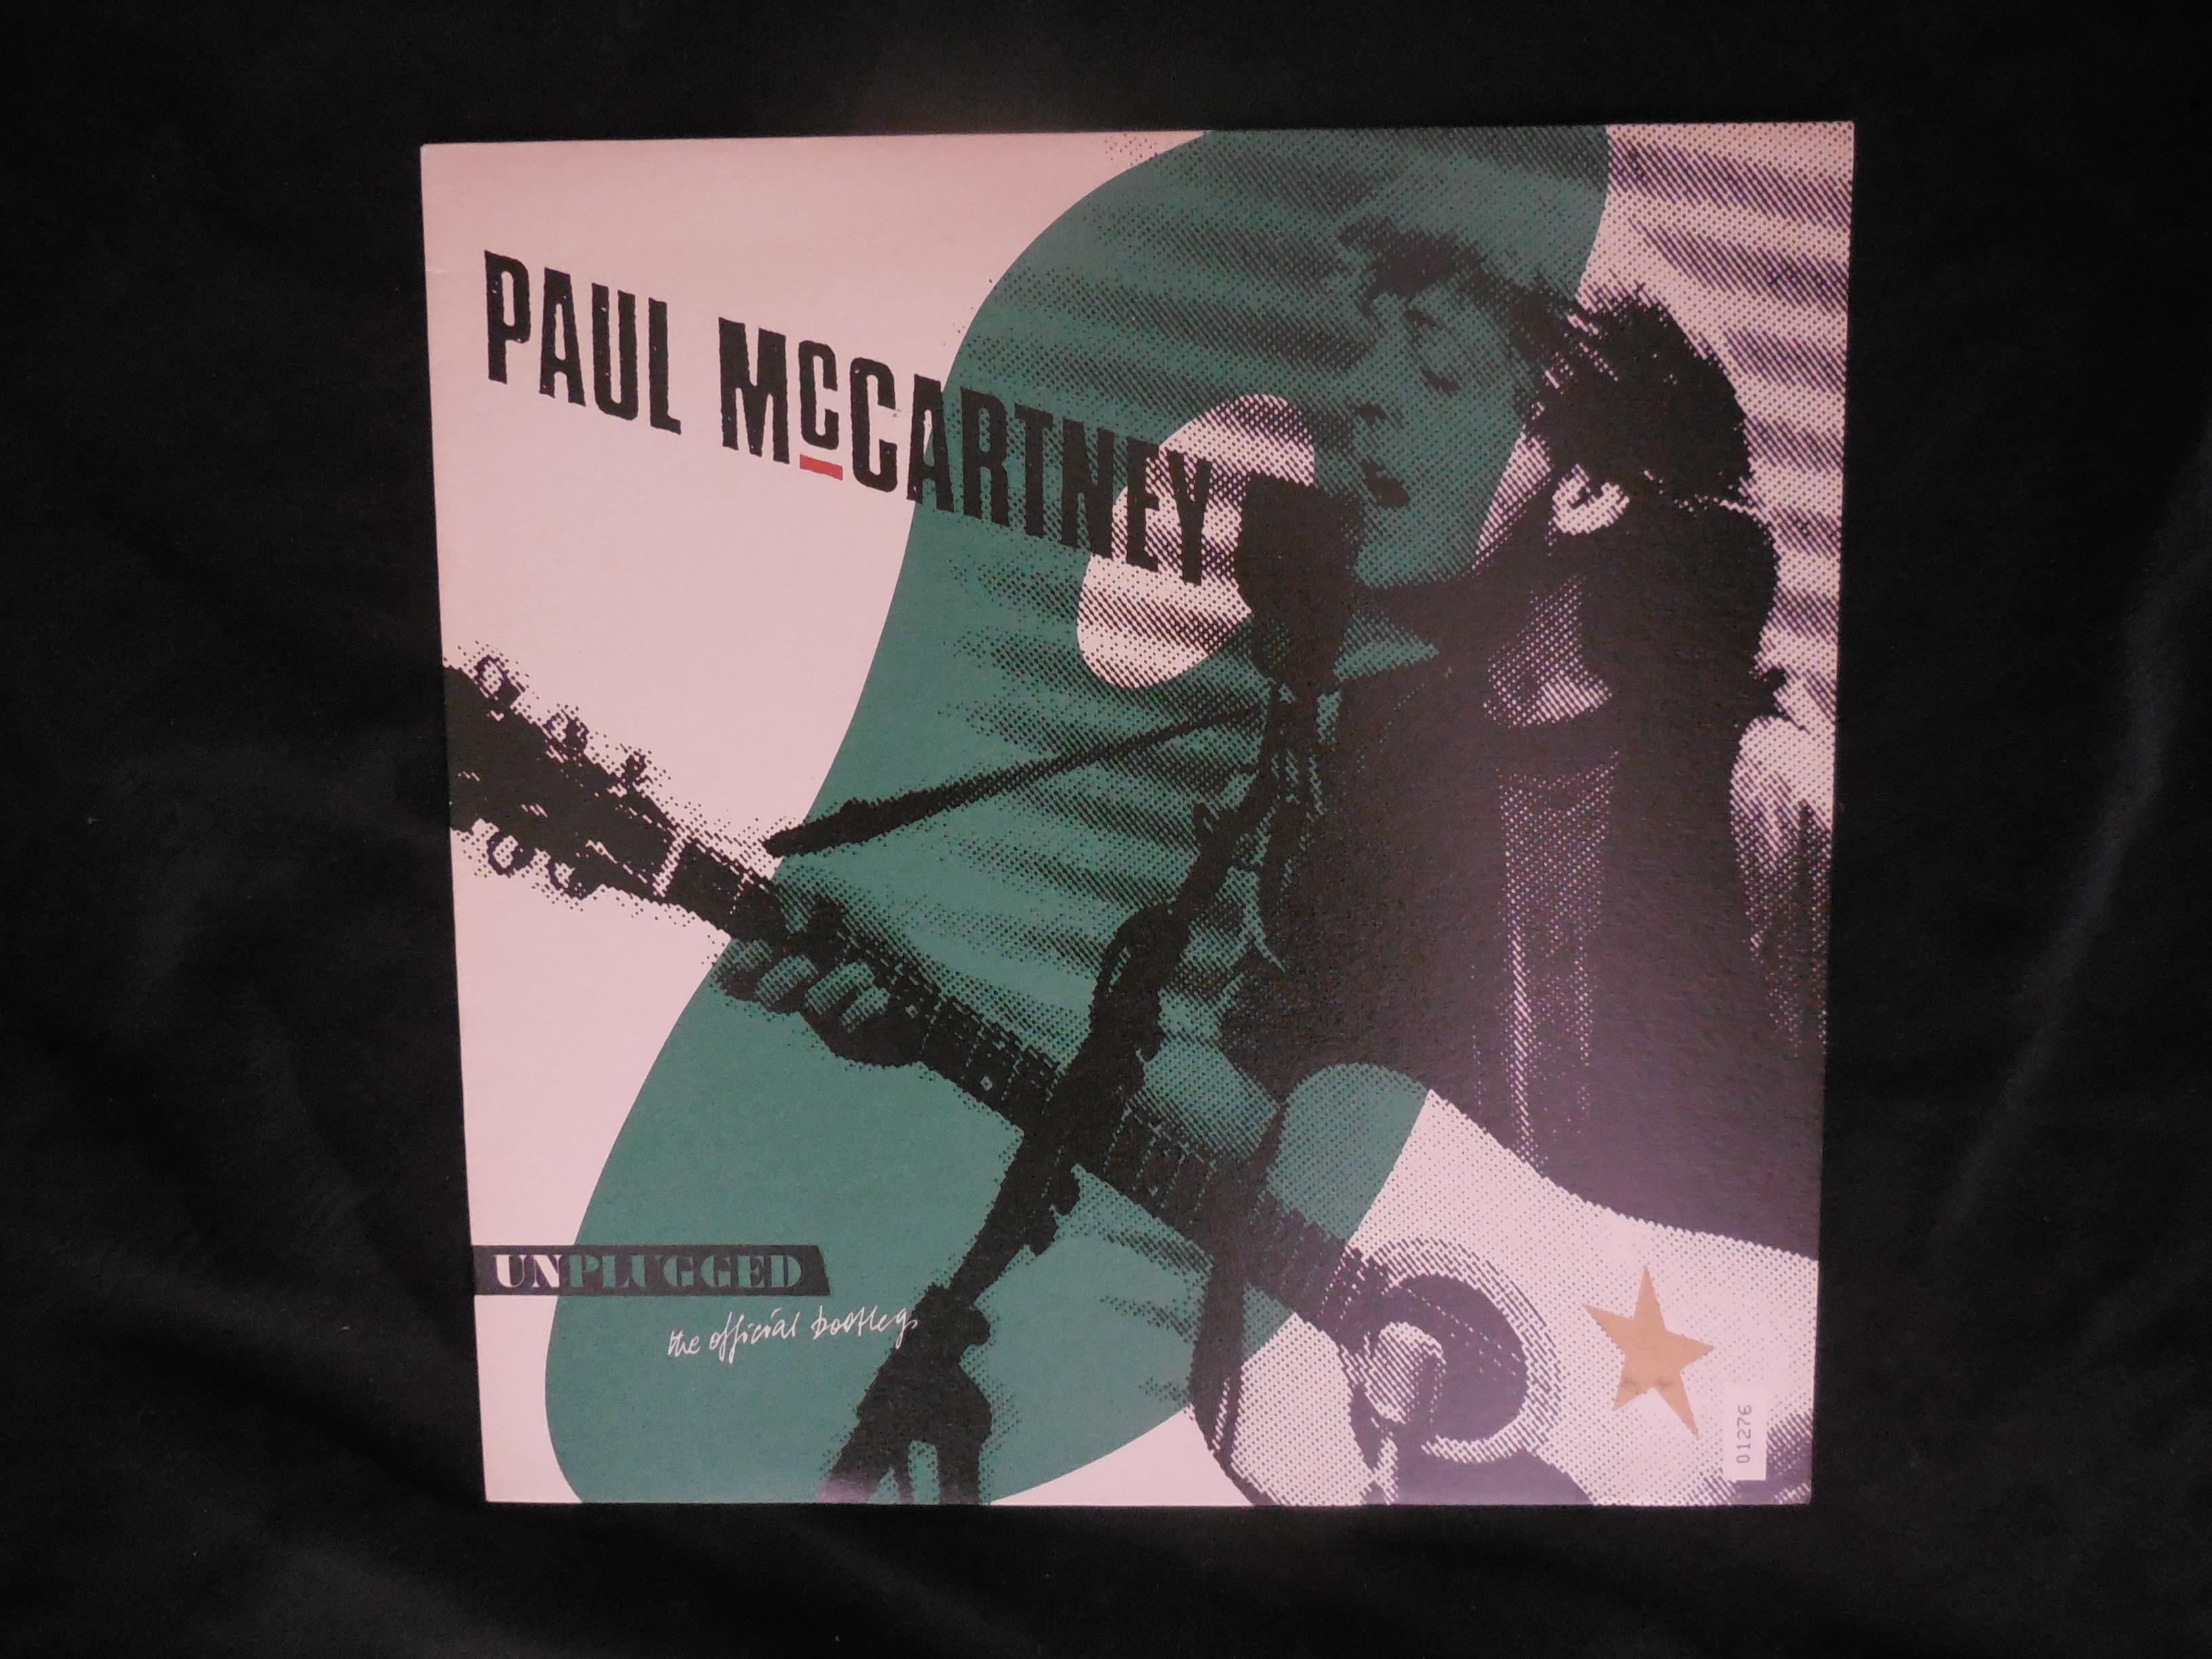 Paul McCartney-Unplugged